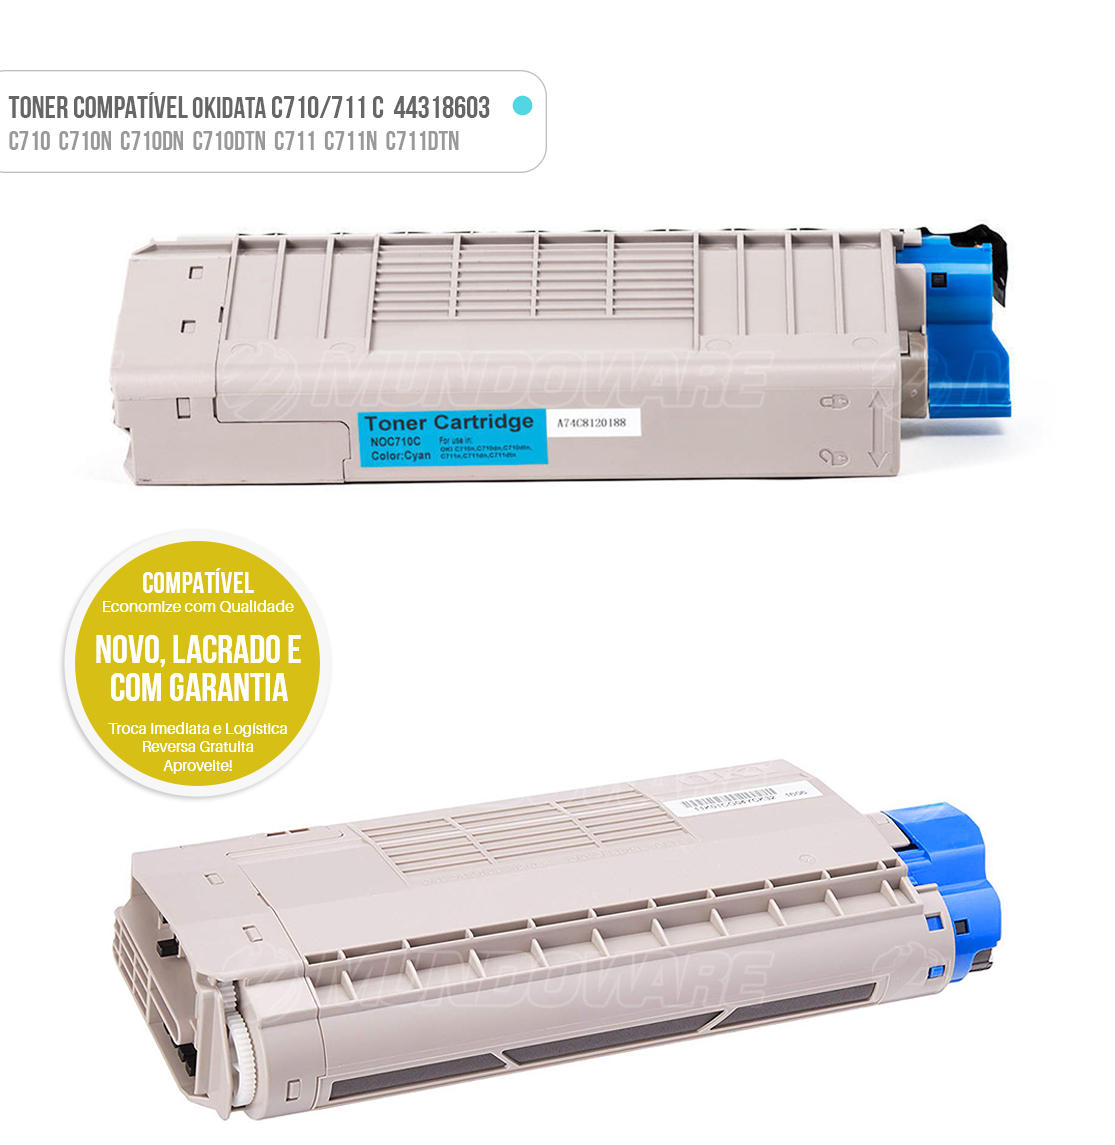 Toner Ciano Compatível para impressora Okidata C710 C710N C710DN C710DTN C711 C711N C711DTN Tonner